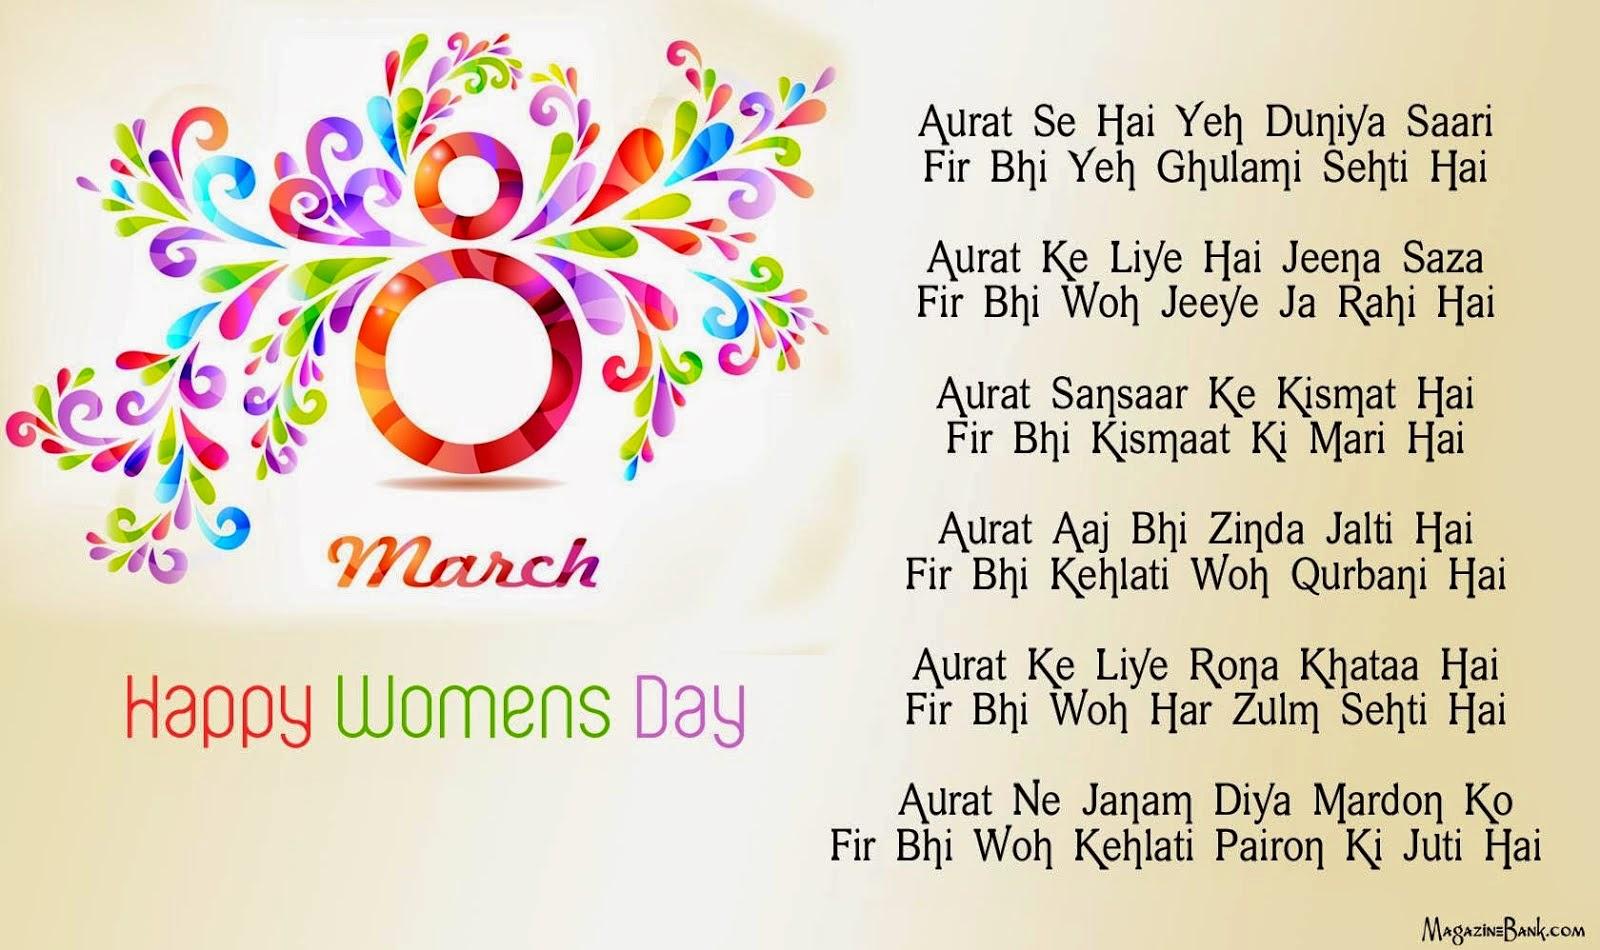 Birthday Wish In English Sms : Hindi shayari dosti in english love romantic image sms photos impages pics wallpapers birthday